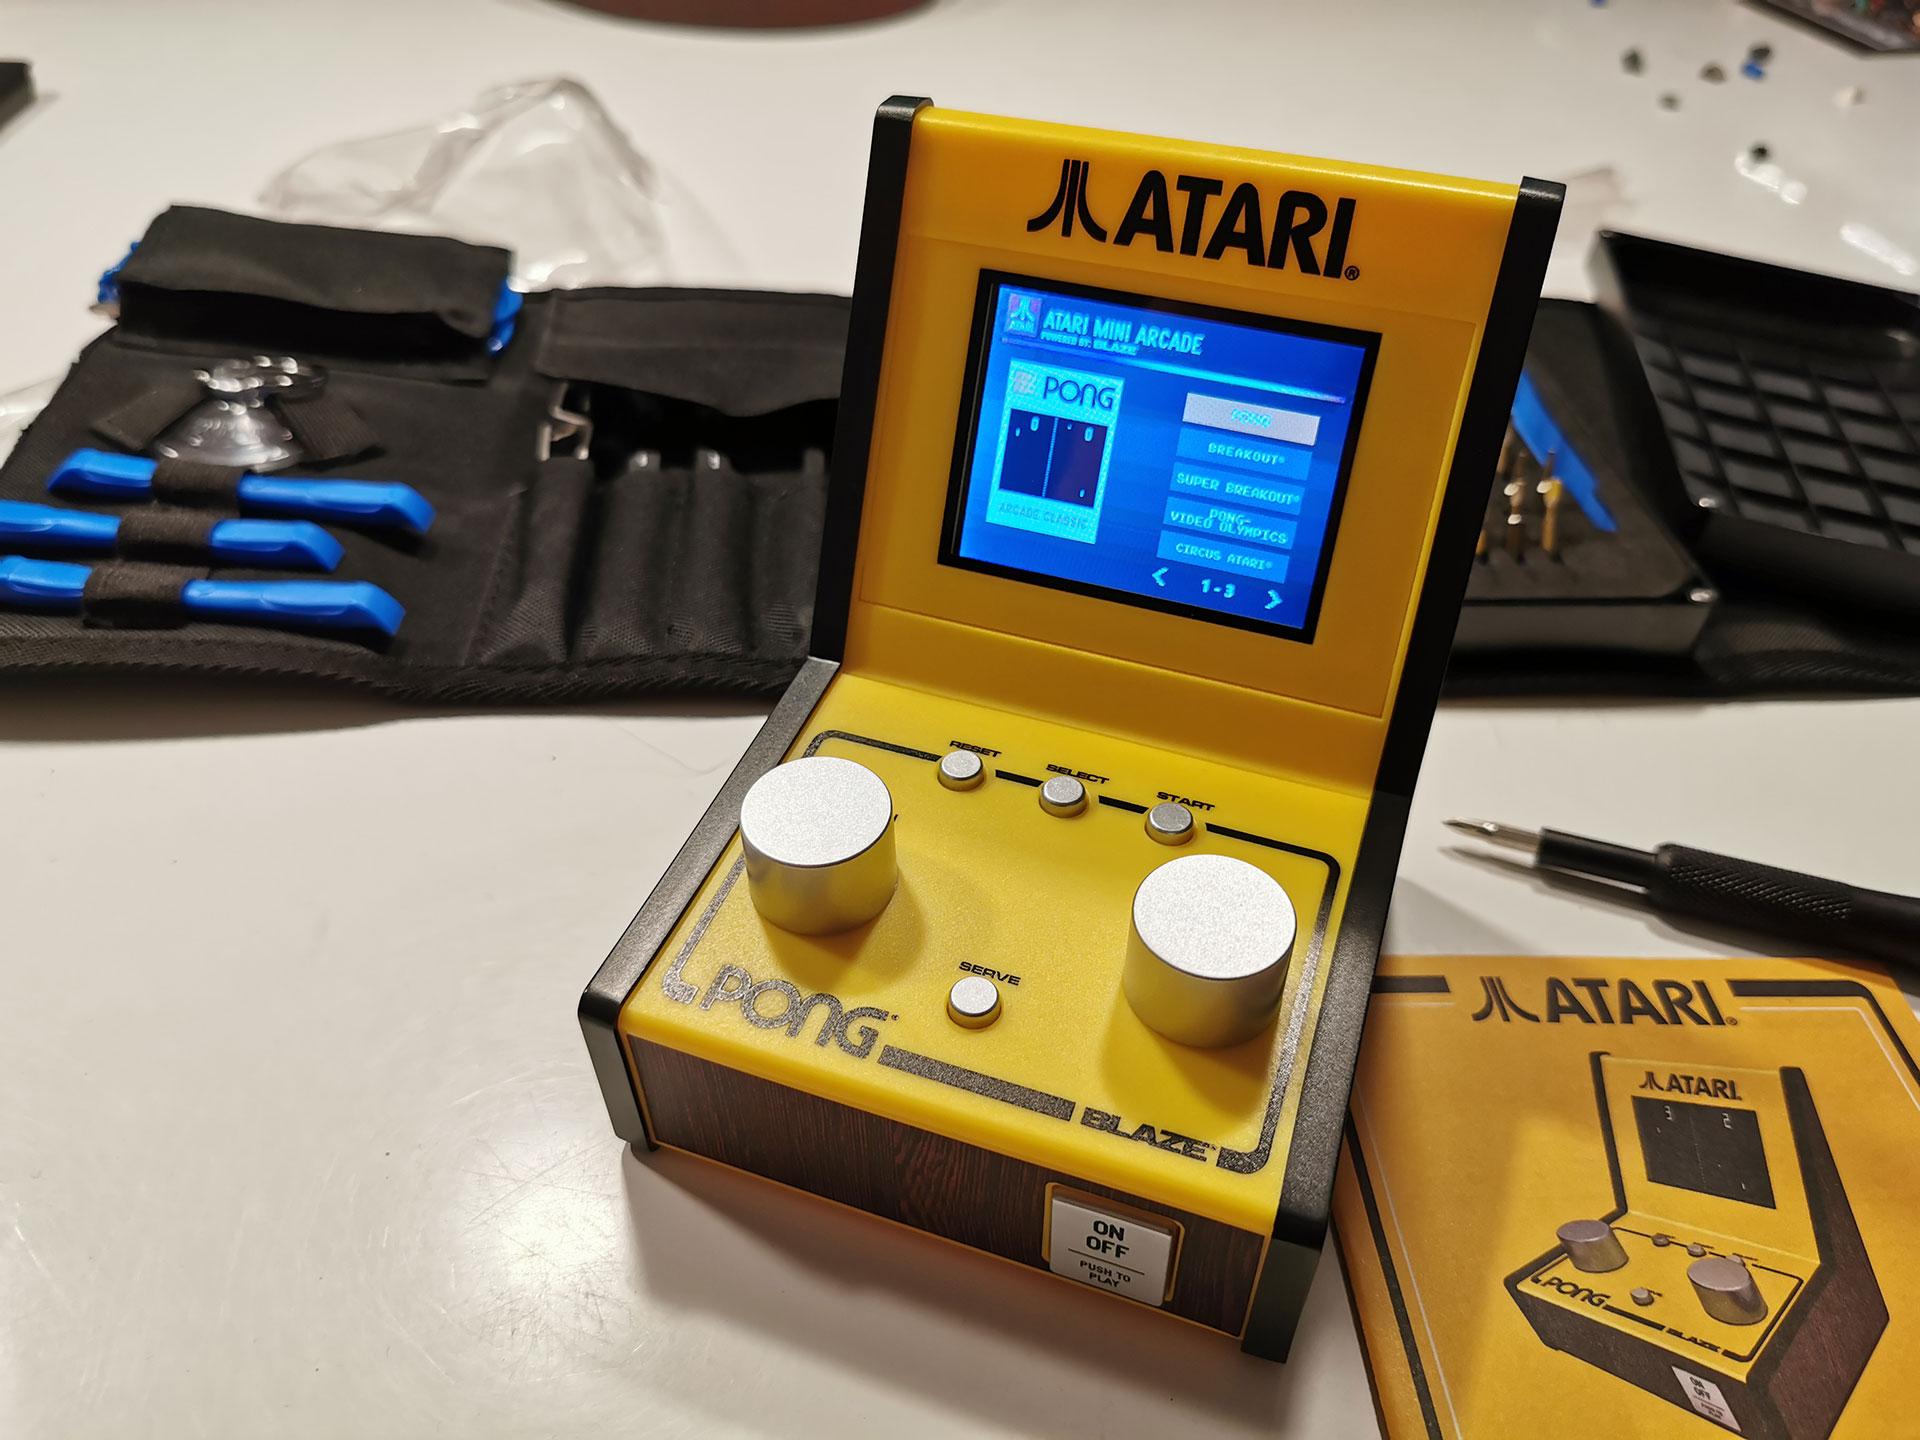 Atari Mini Arcade Pong